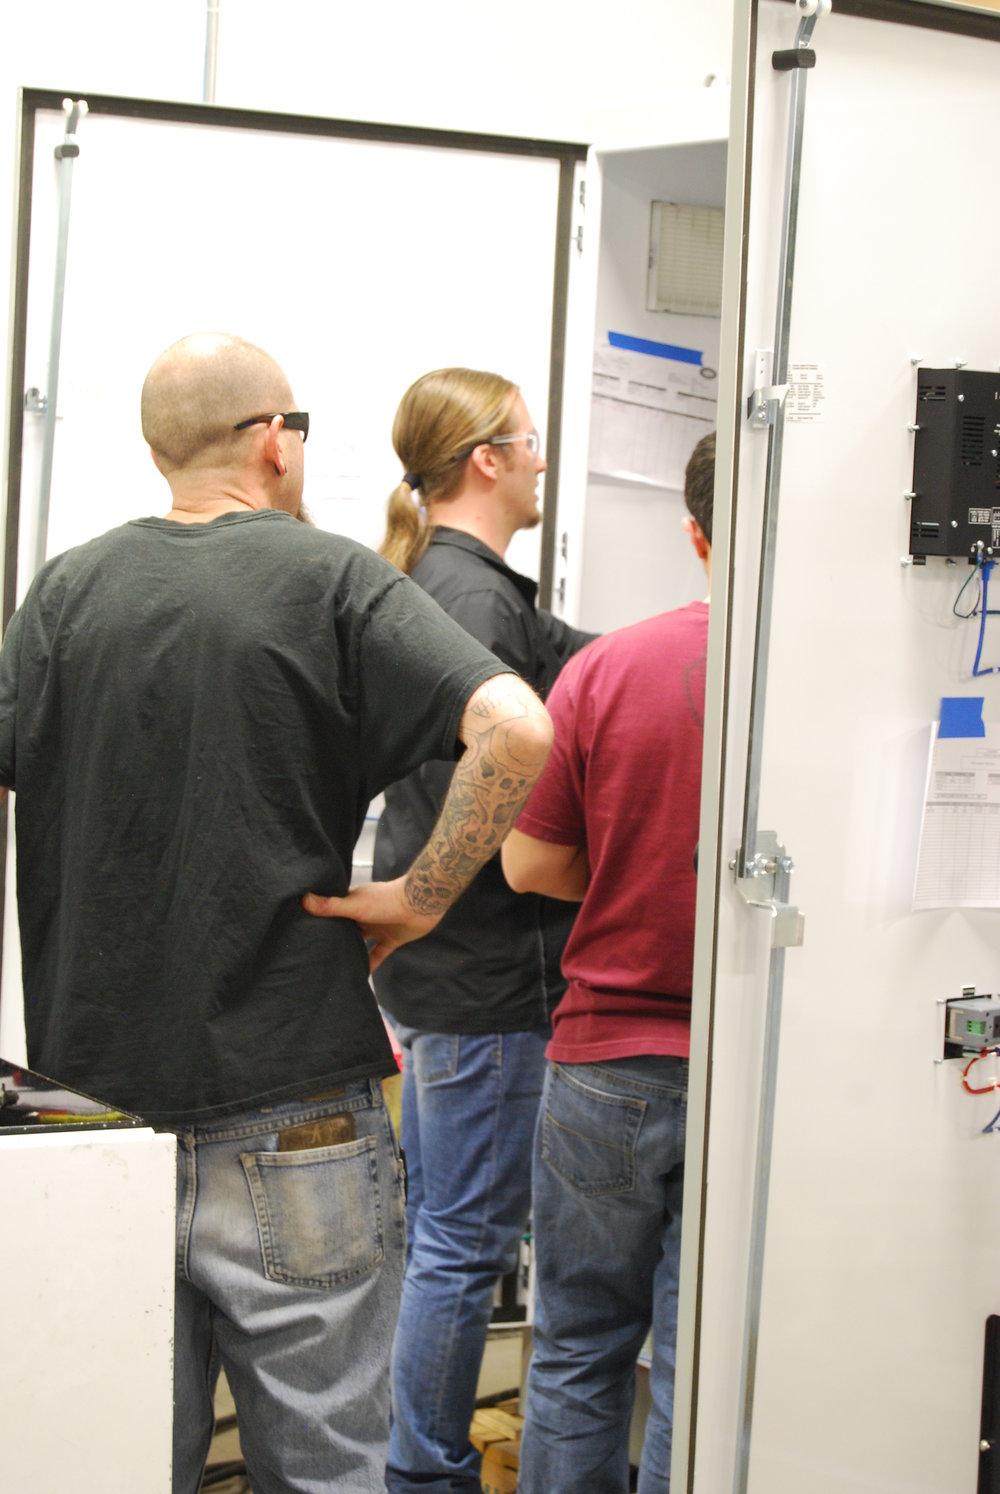 examining control cabinets